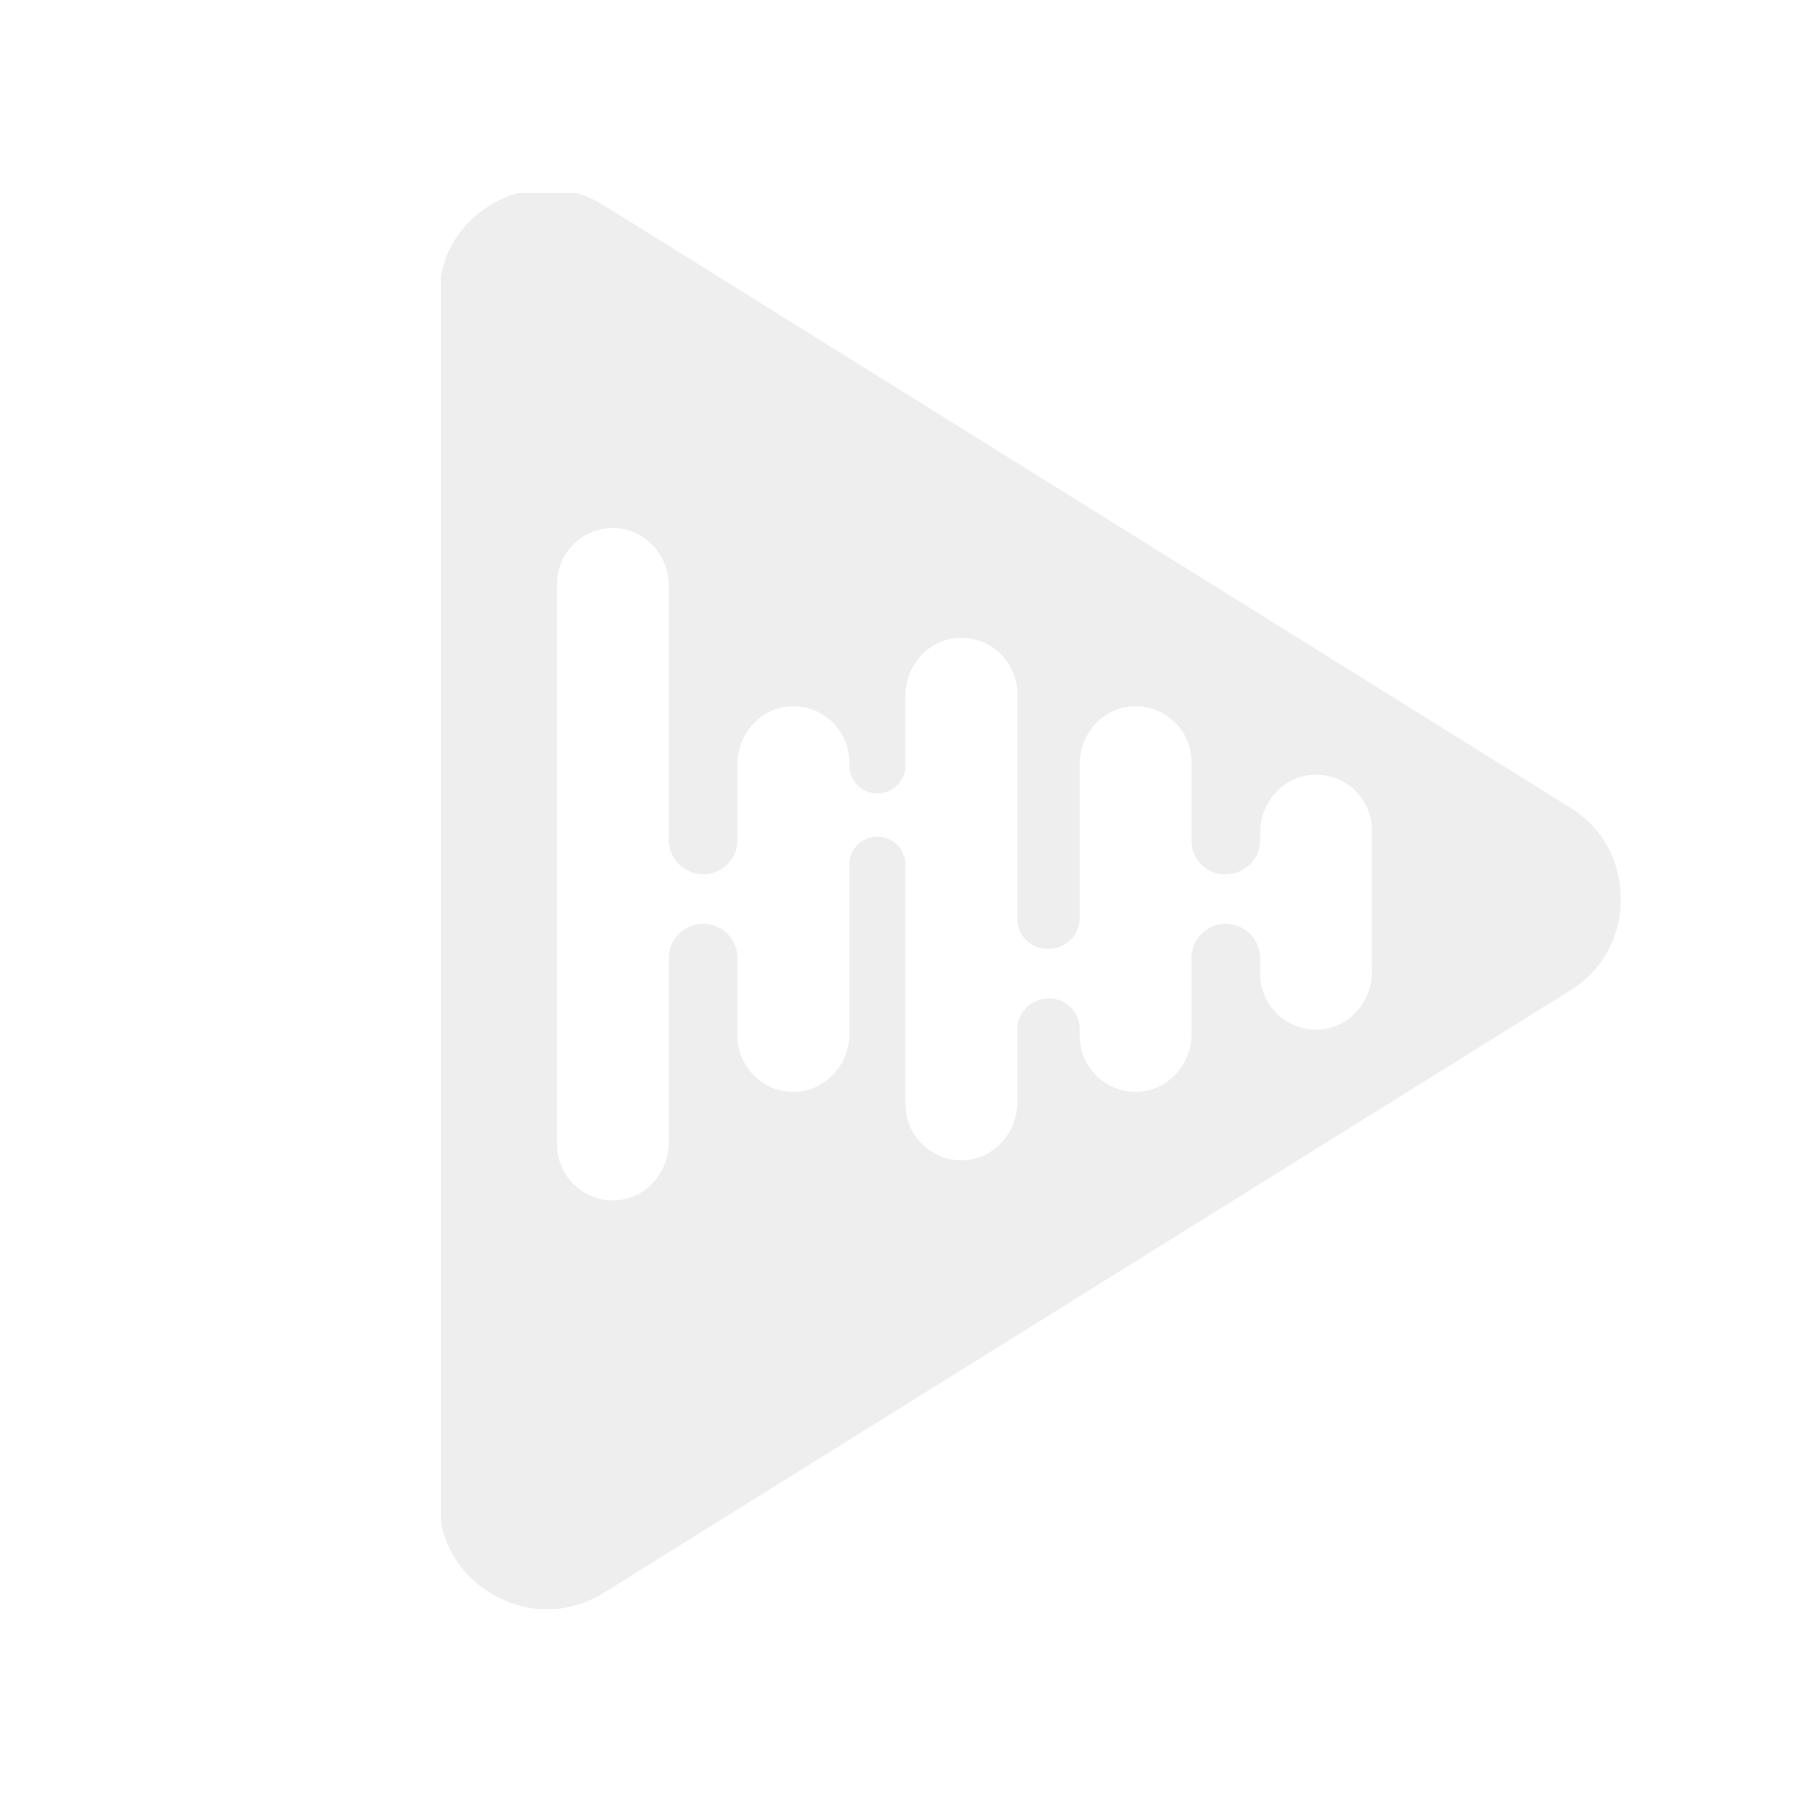 Grandview 148303 - Rammespent lerret, kurvet, hvit, 203x114, 16:9, 92